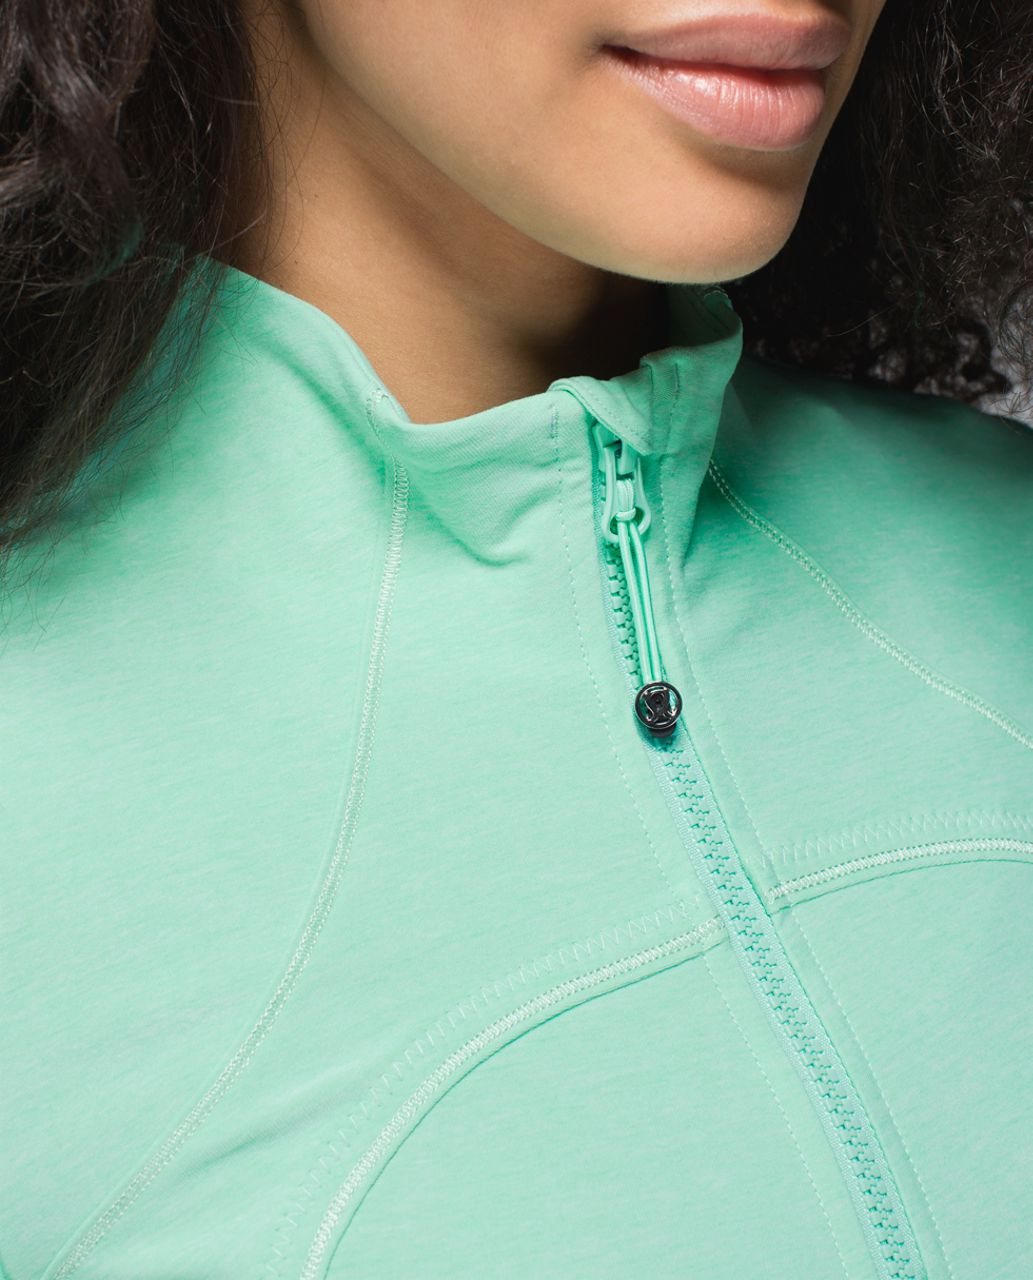 Lululemon Forme Jacket *Cuffins - Heathered Opal